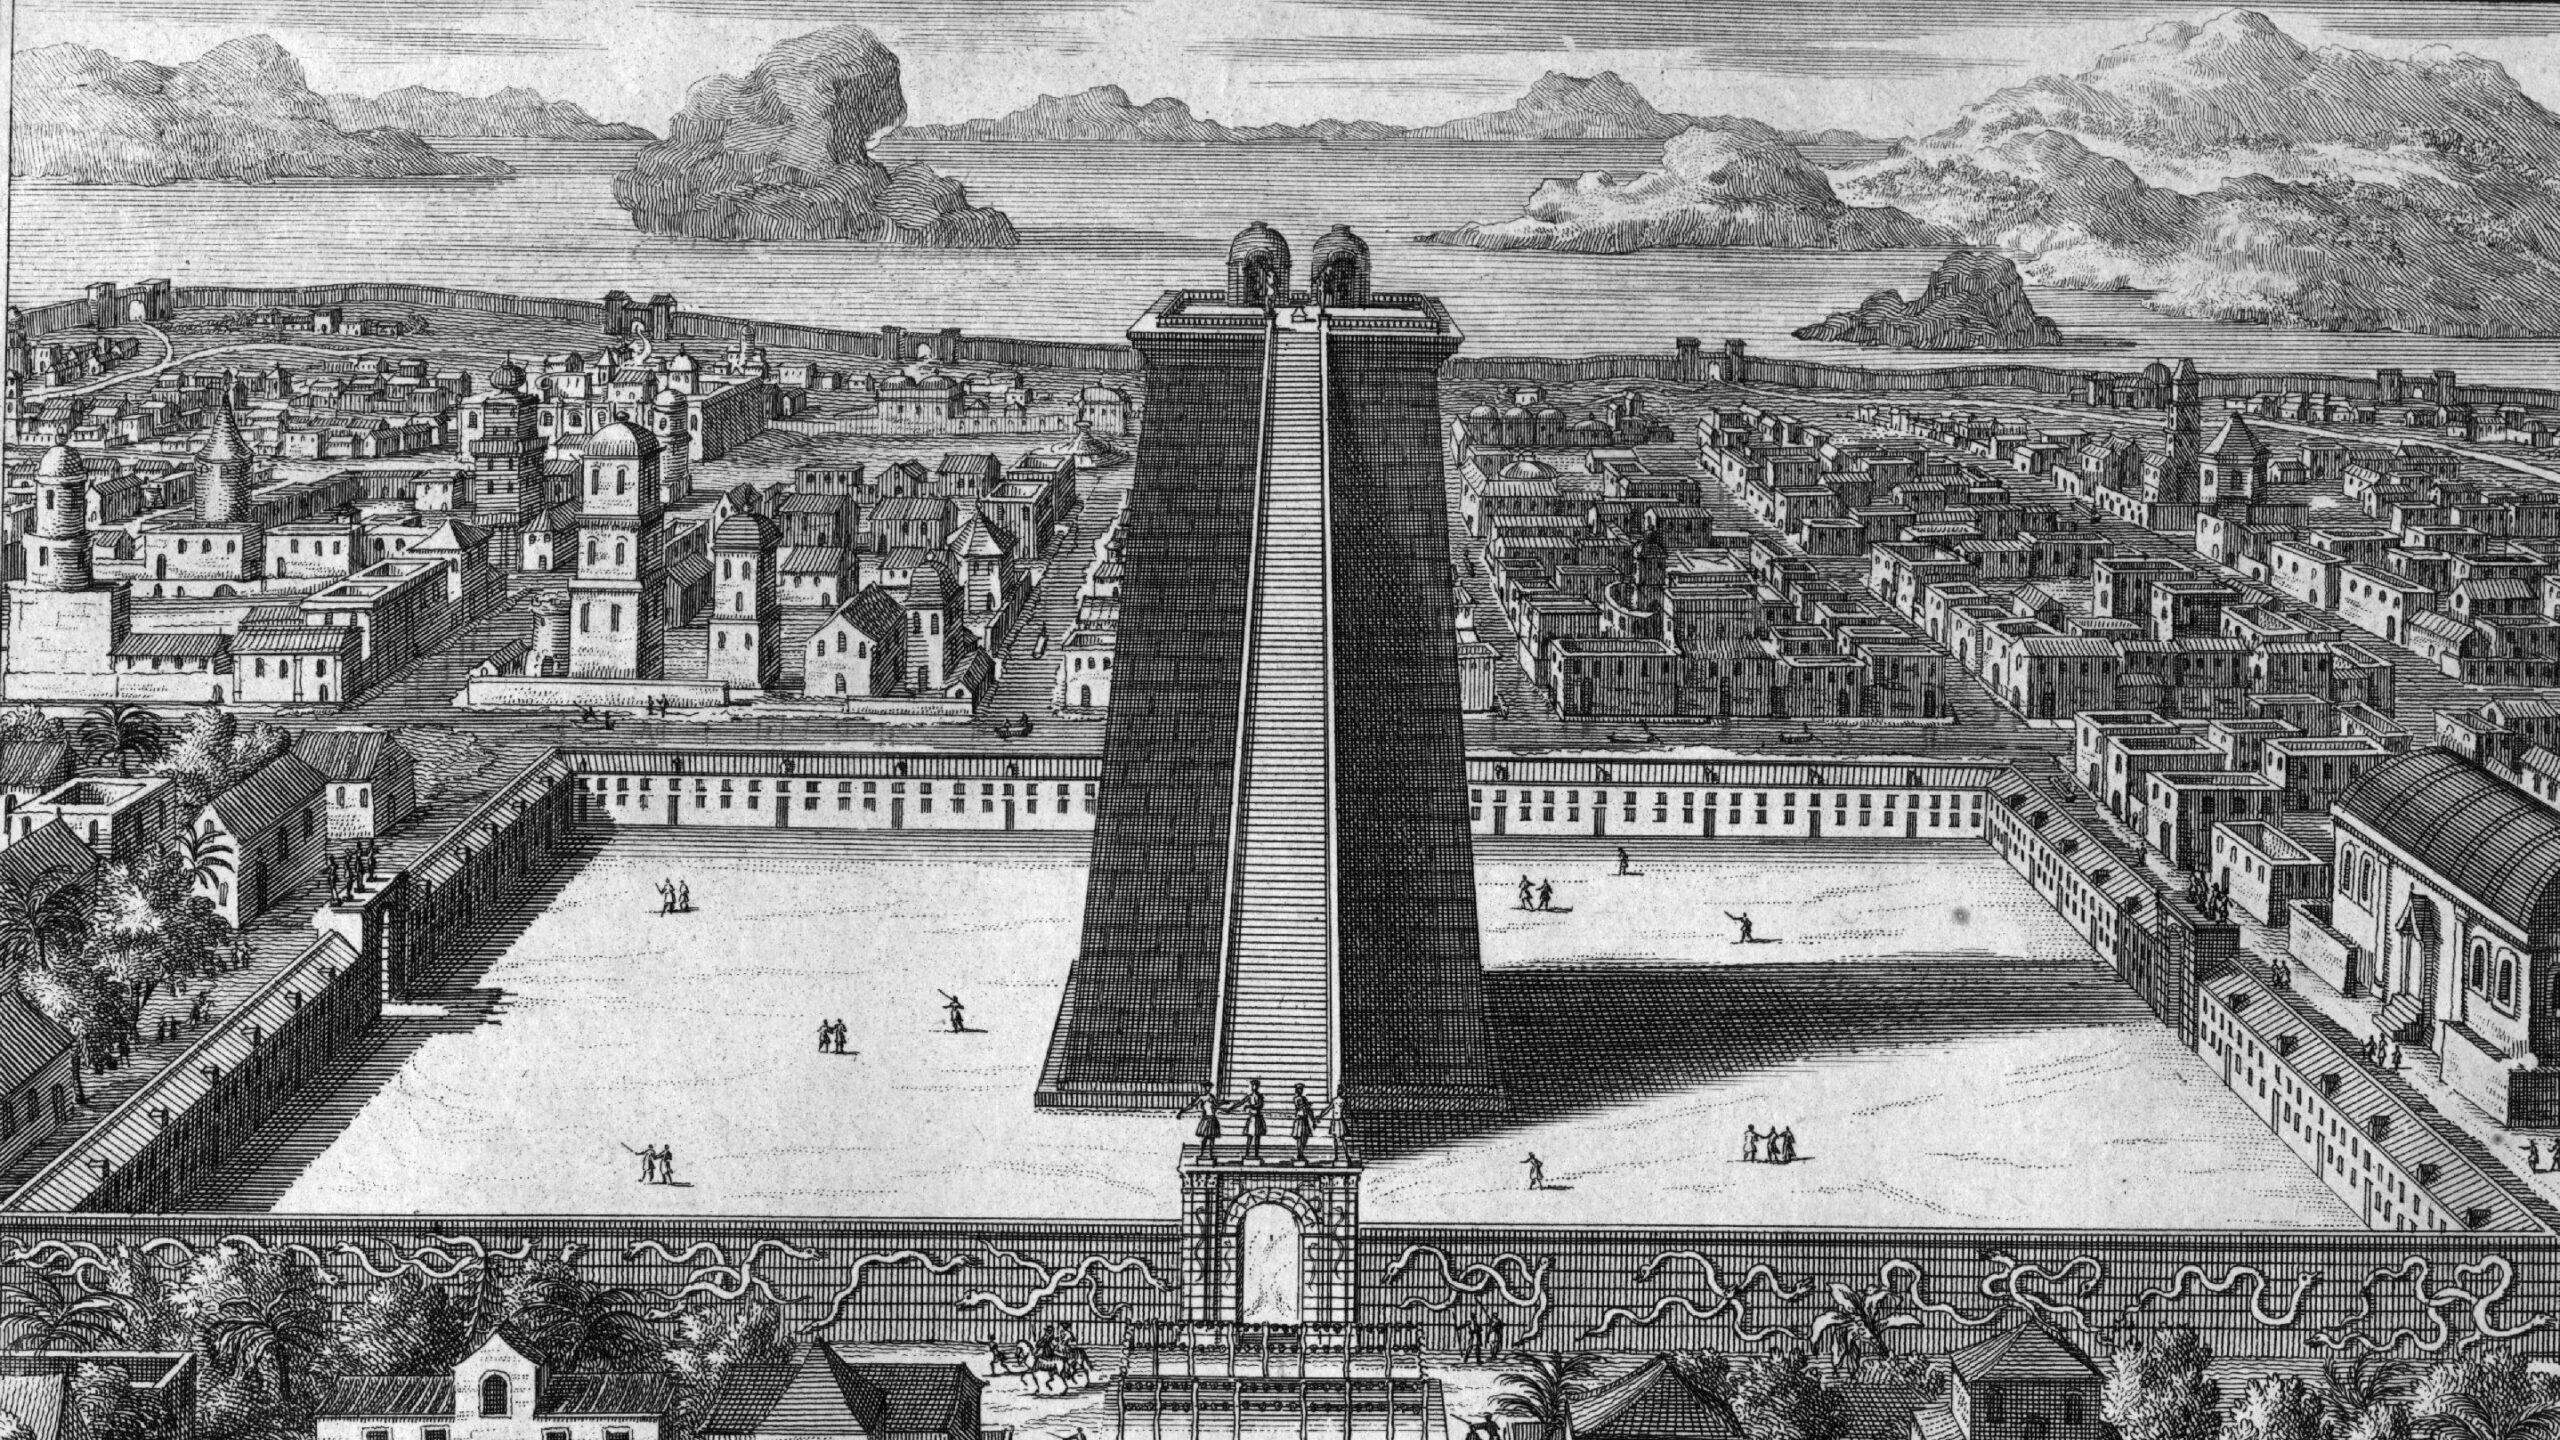 The Aztec Origins of Mexico's Name